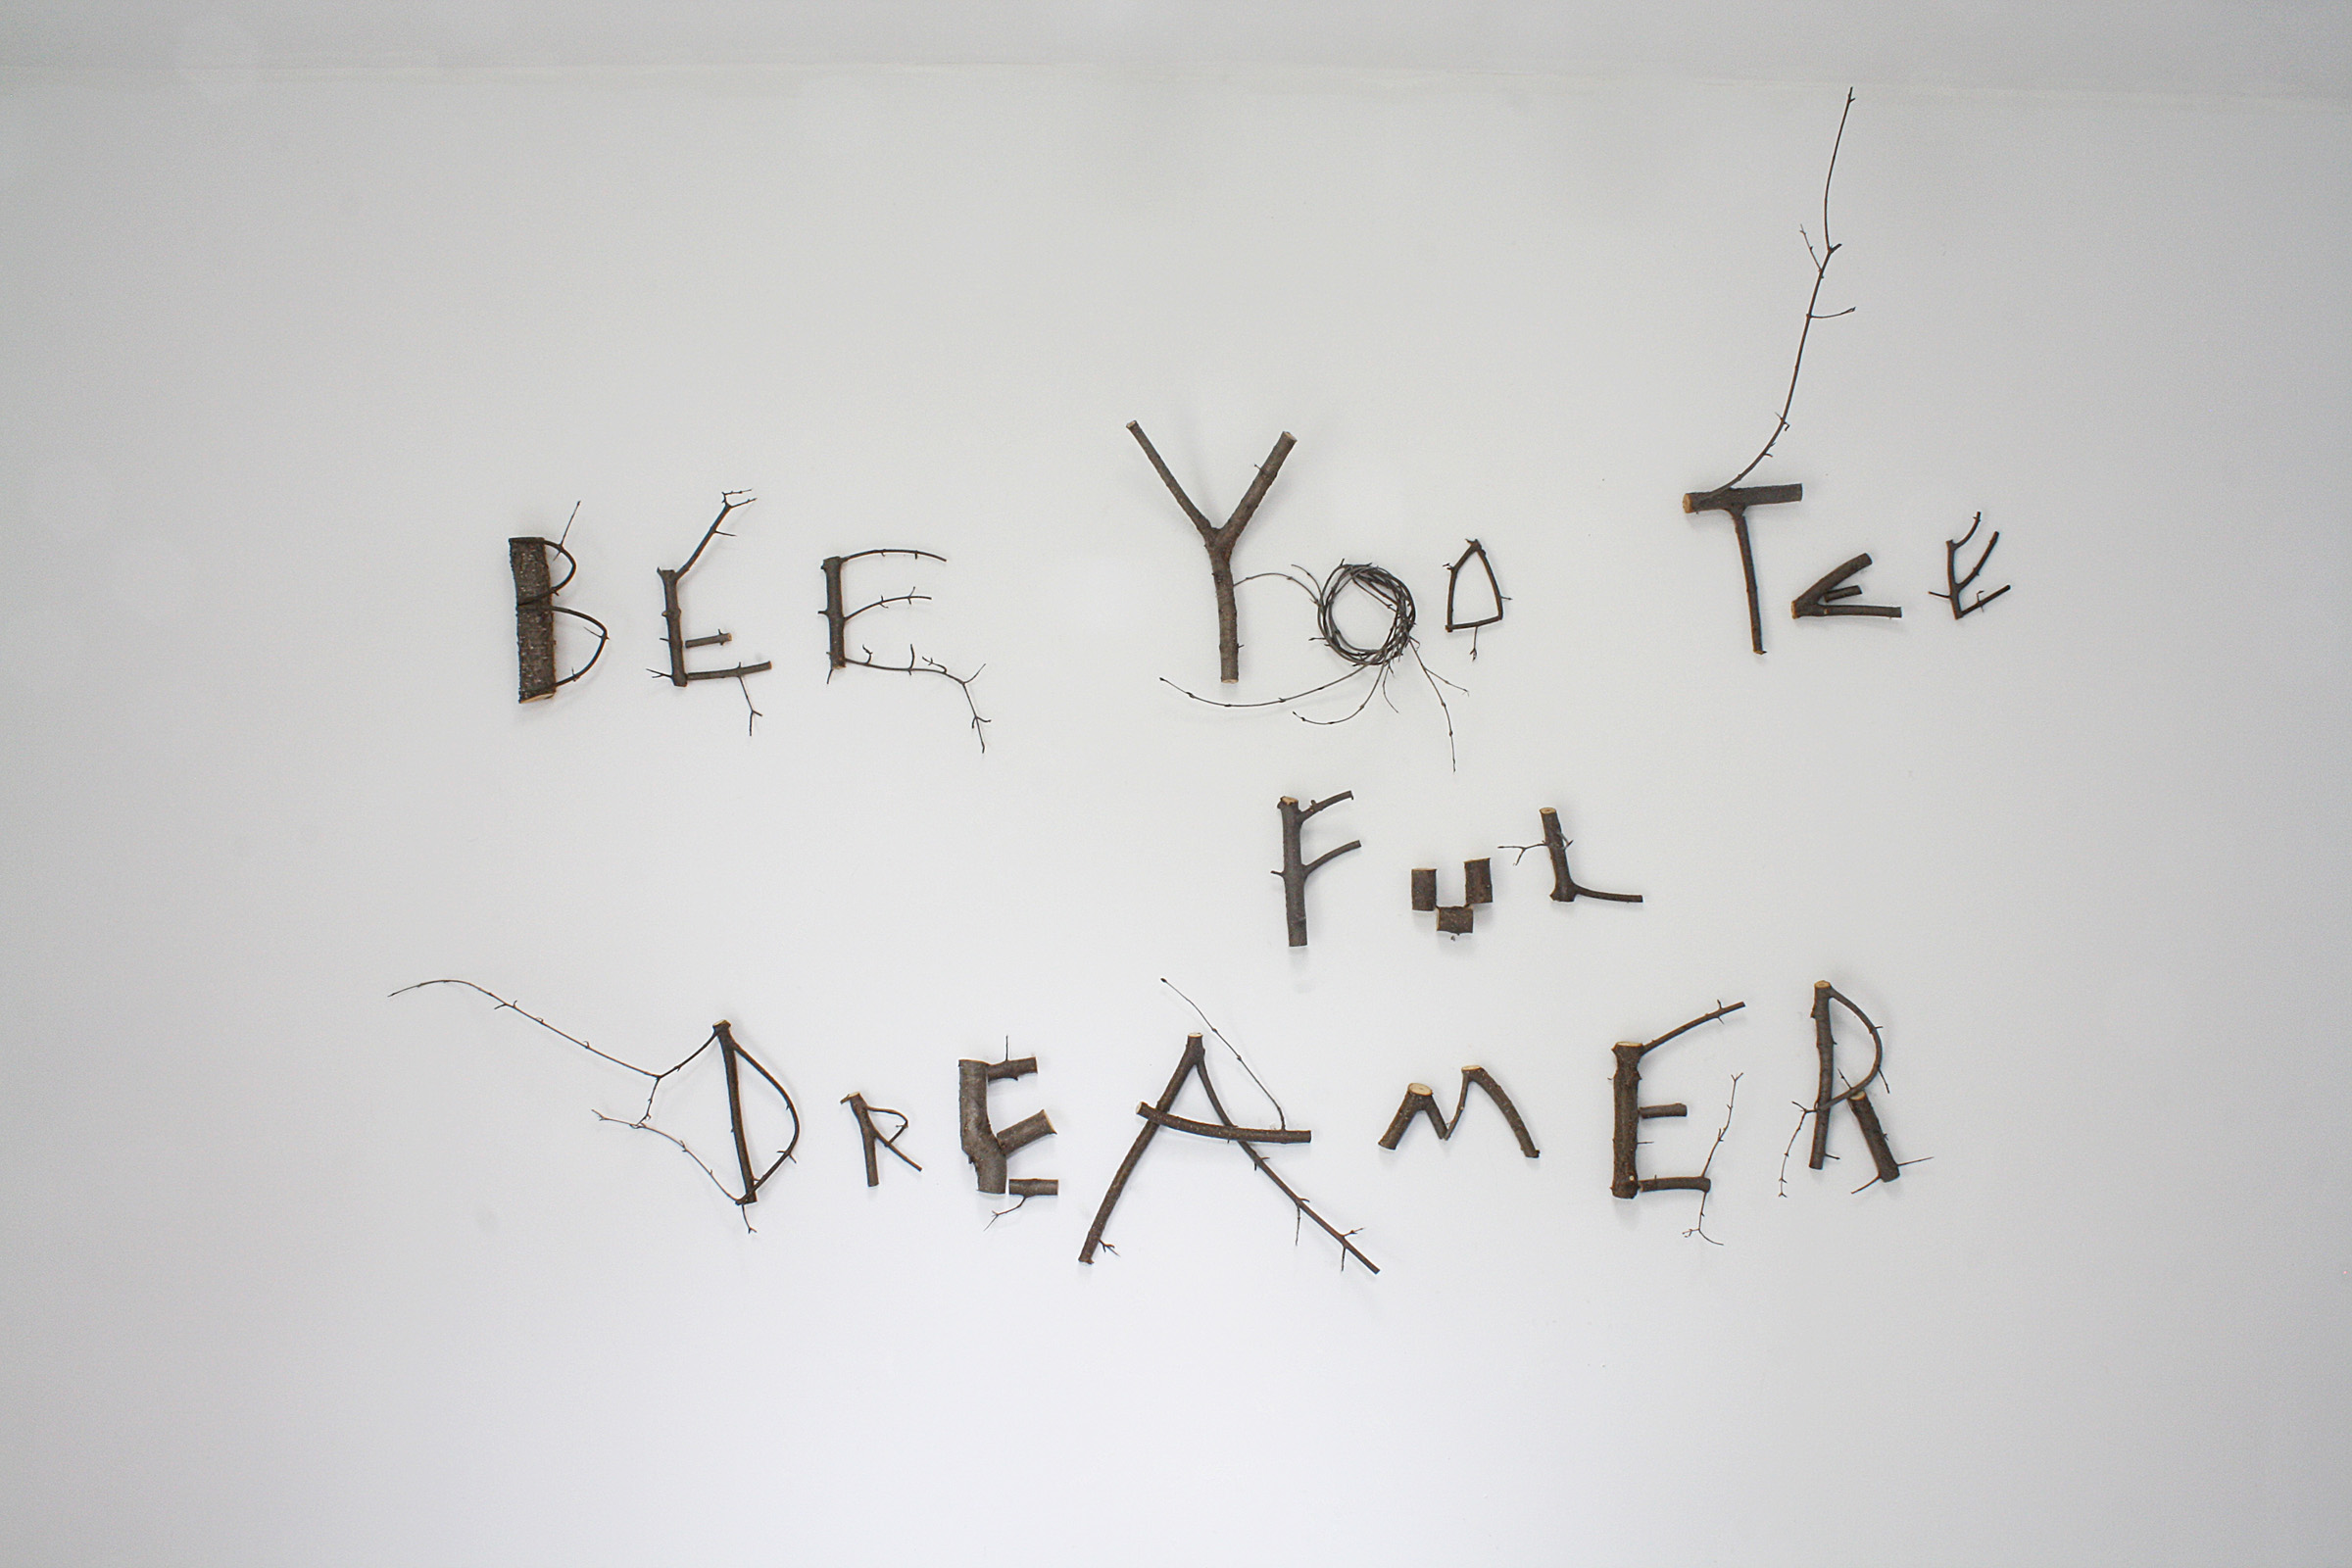 Bee Yoo Tee Full Dreamer web image.jpg